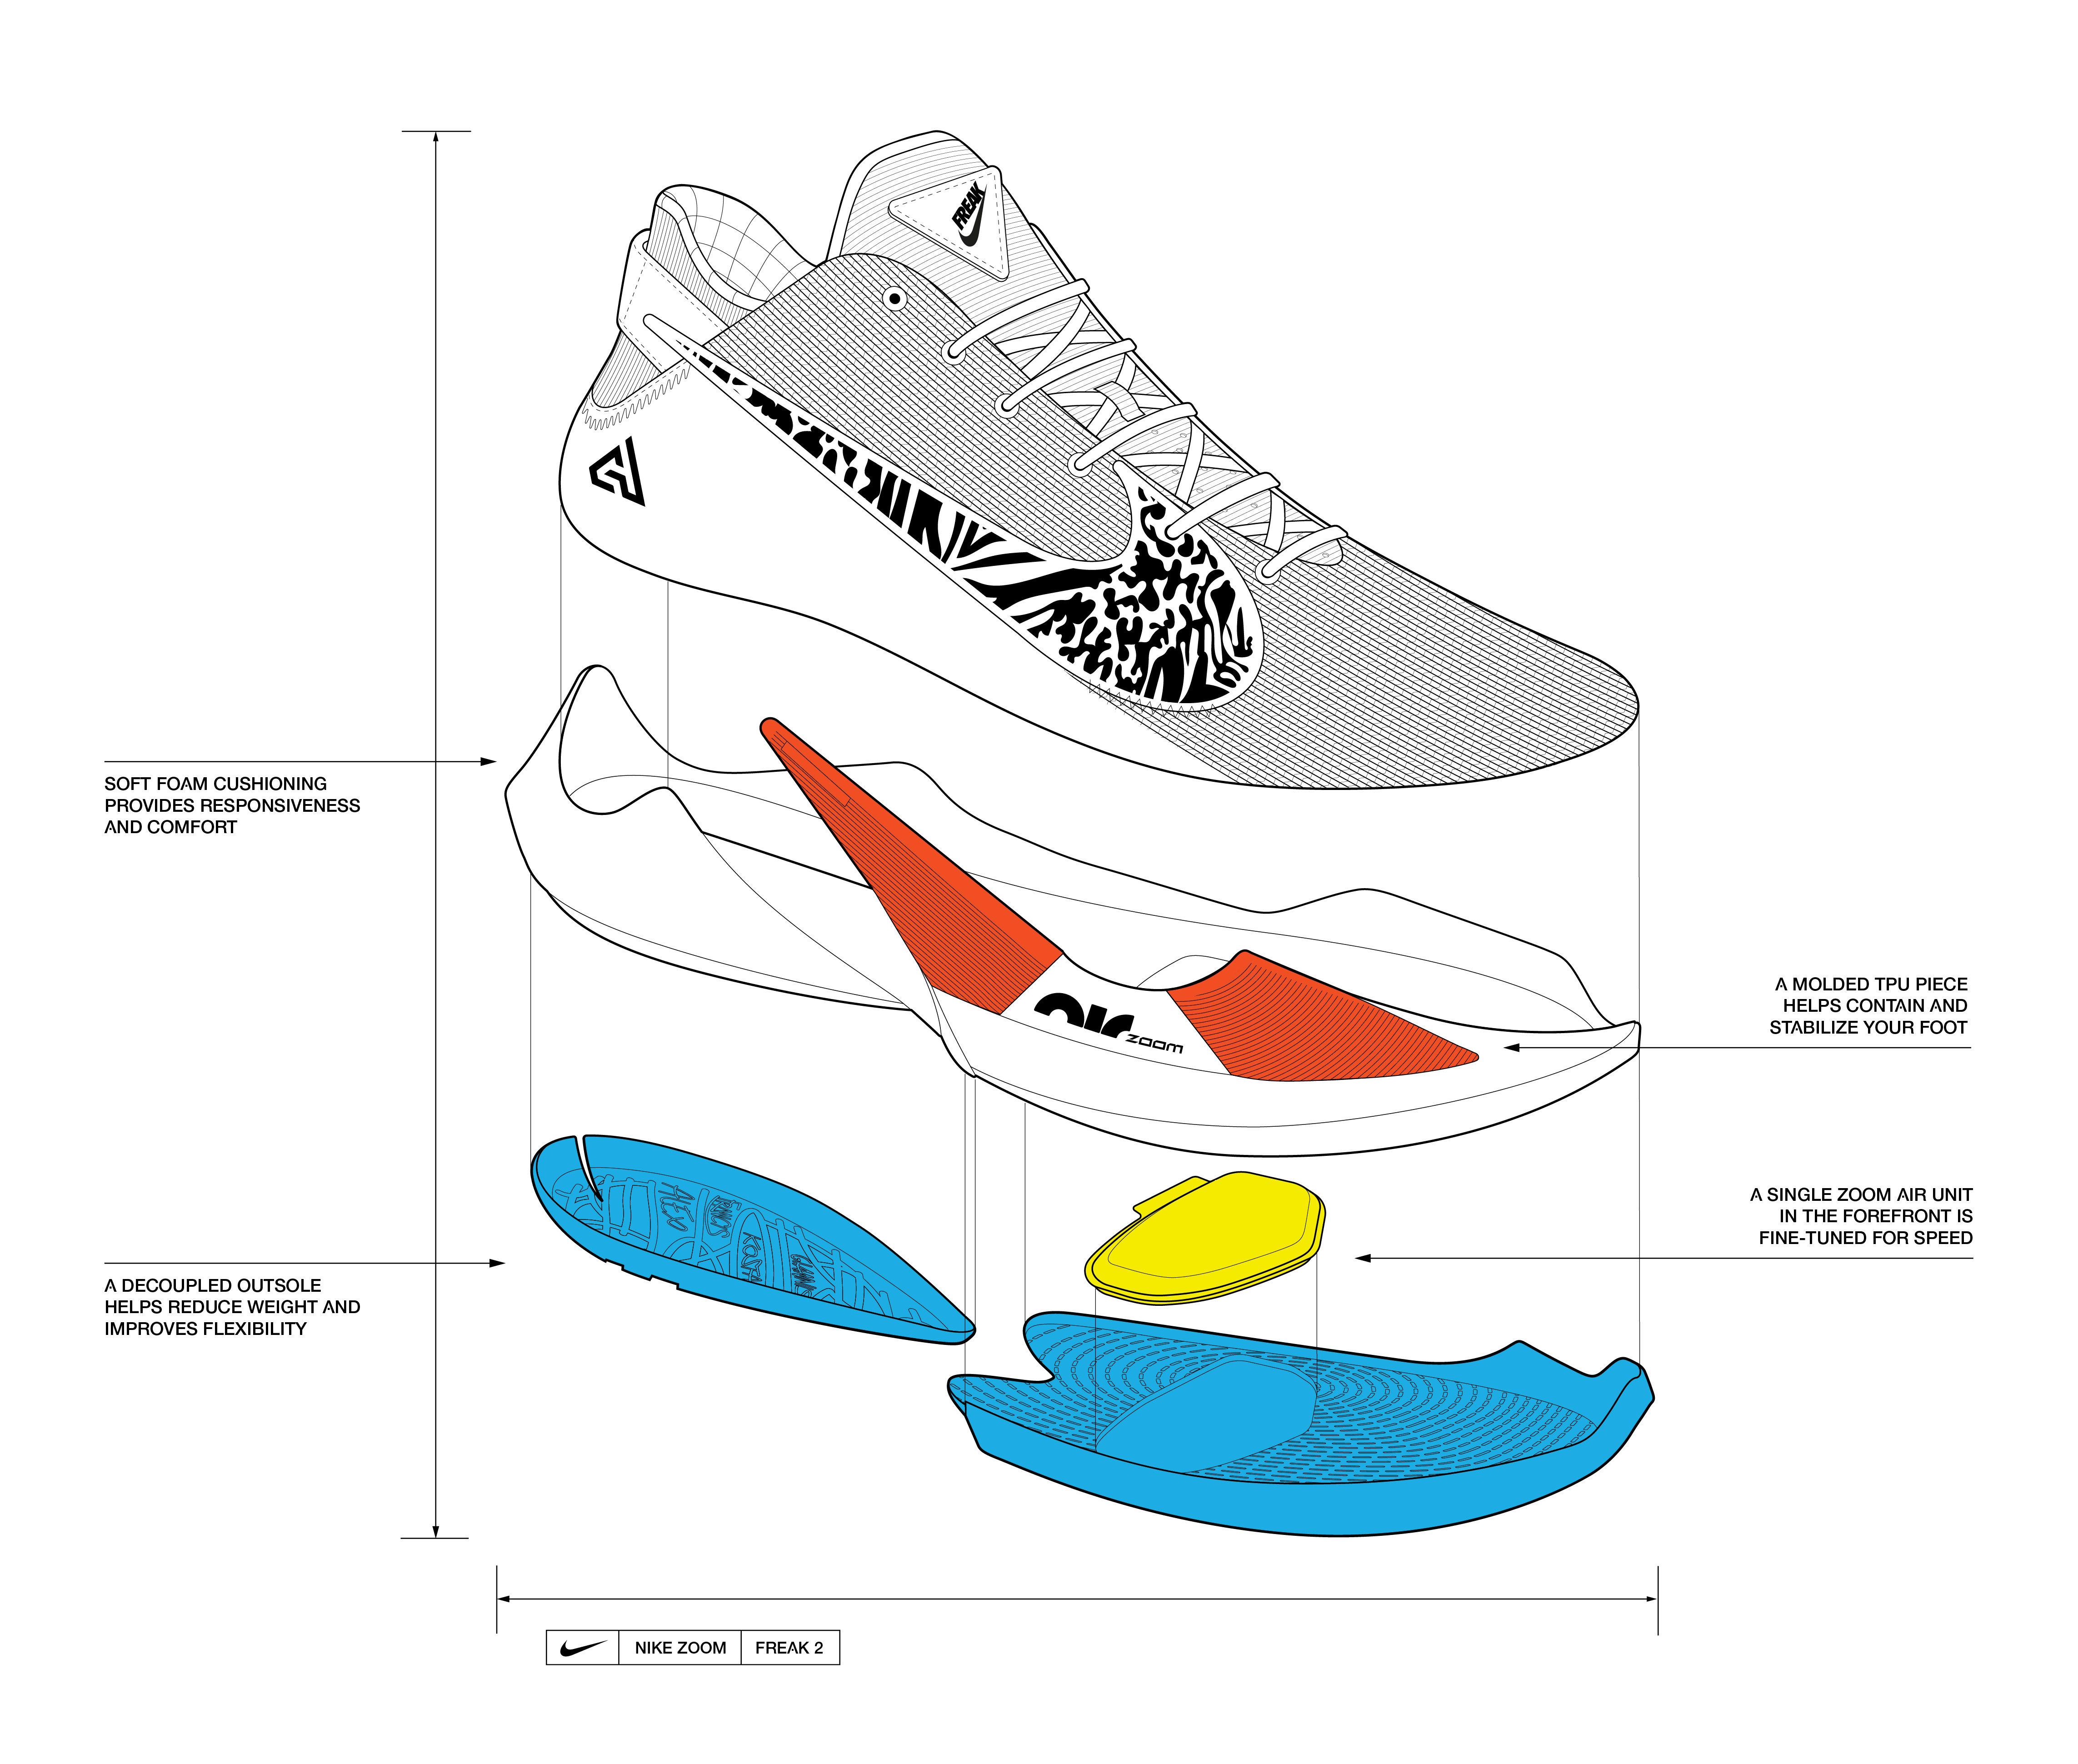 Nike Zoom Freak 2 Construction